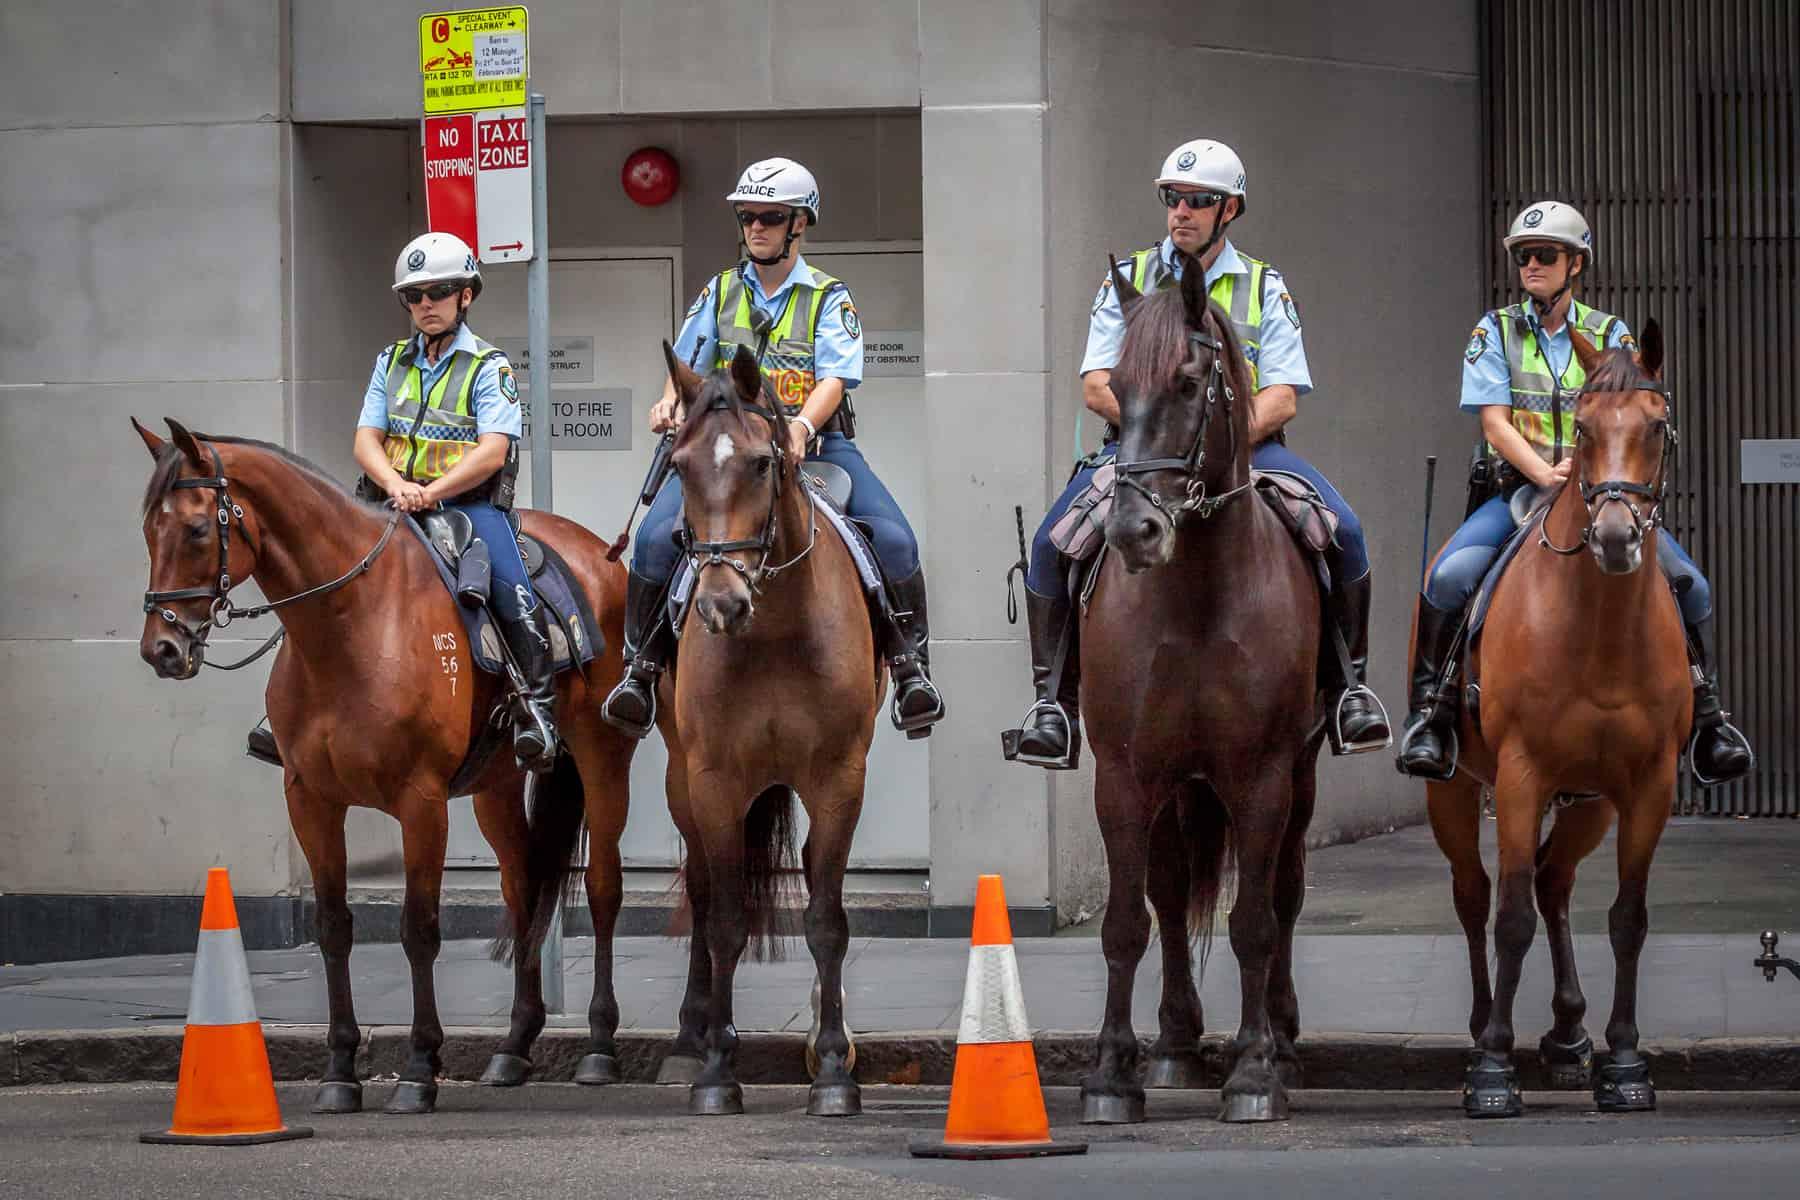 police horse welfare